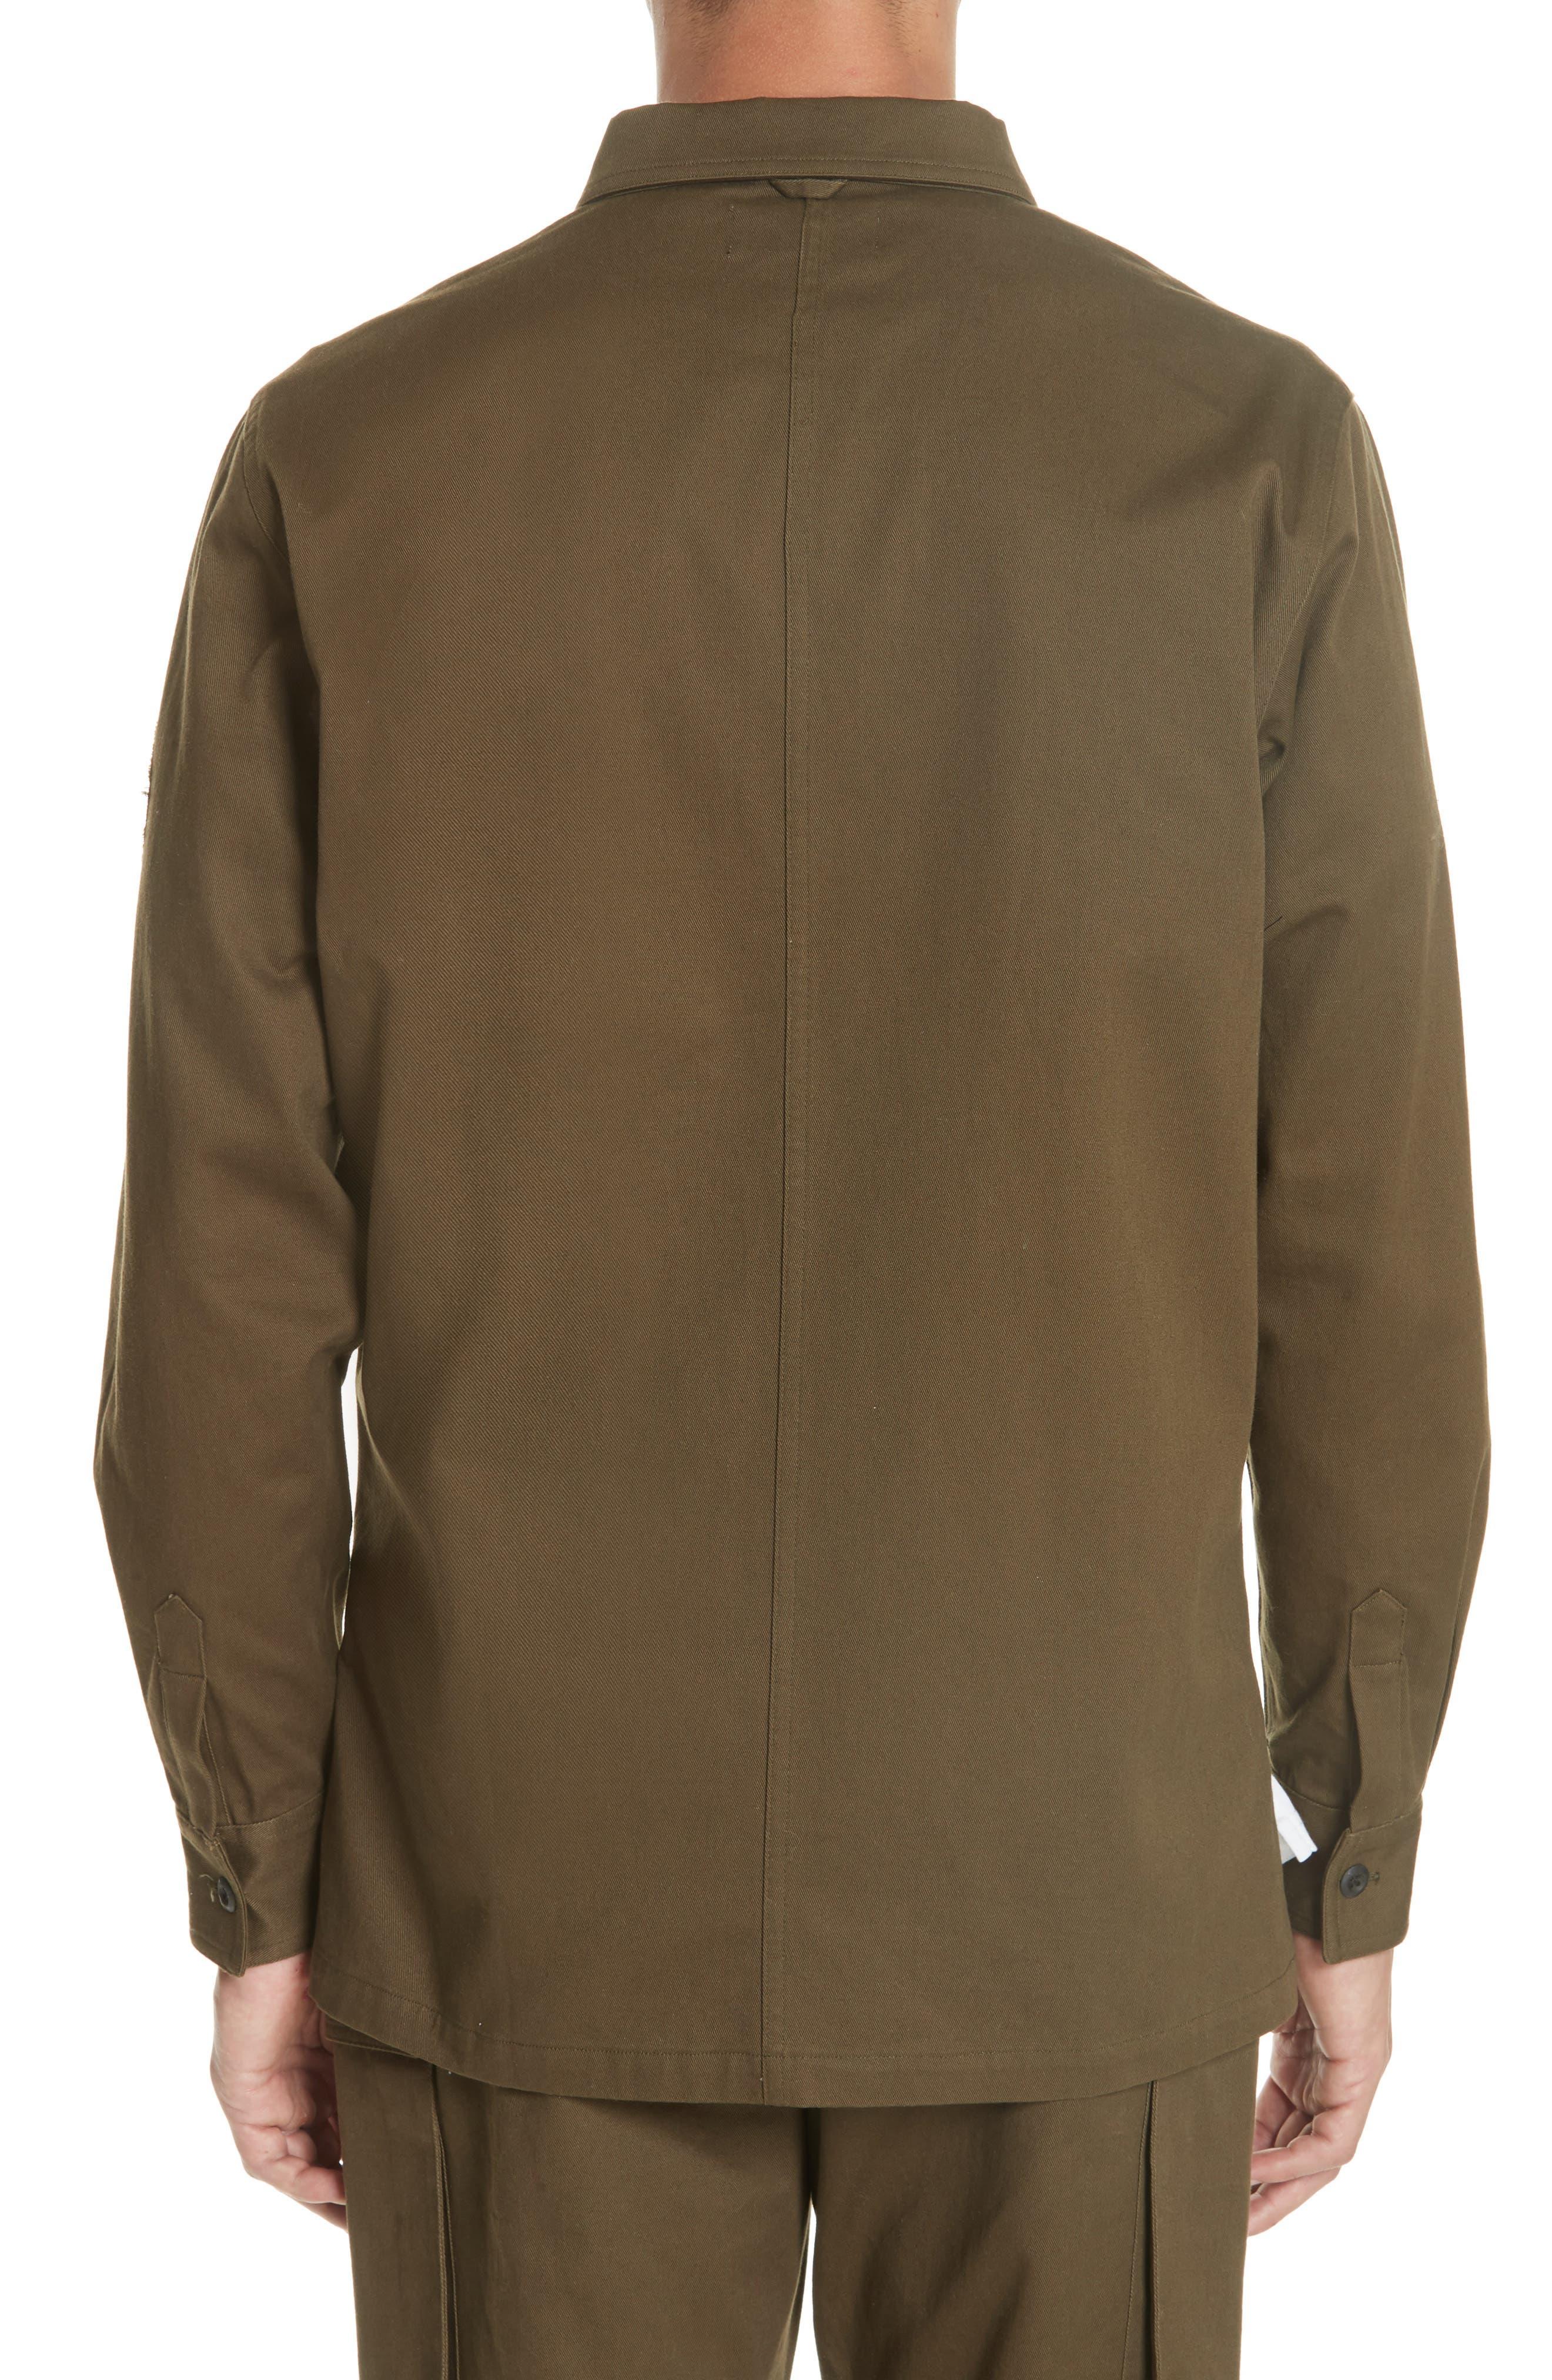 OVADIA & SONS,                             Military Woven Shirt,                             Alternate thumbnail 2, color,                             325